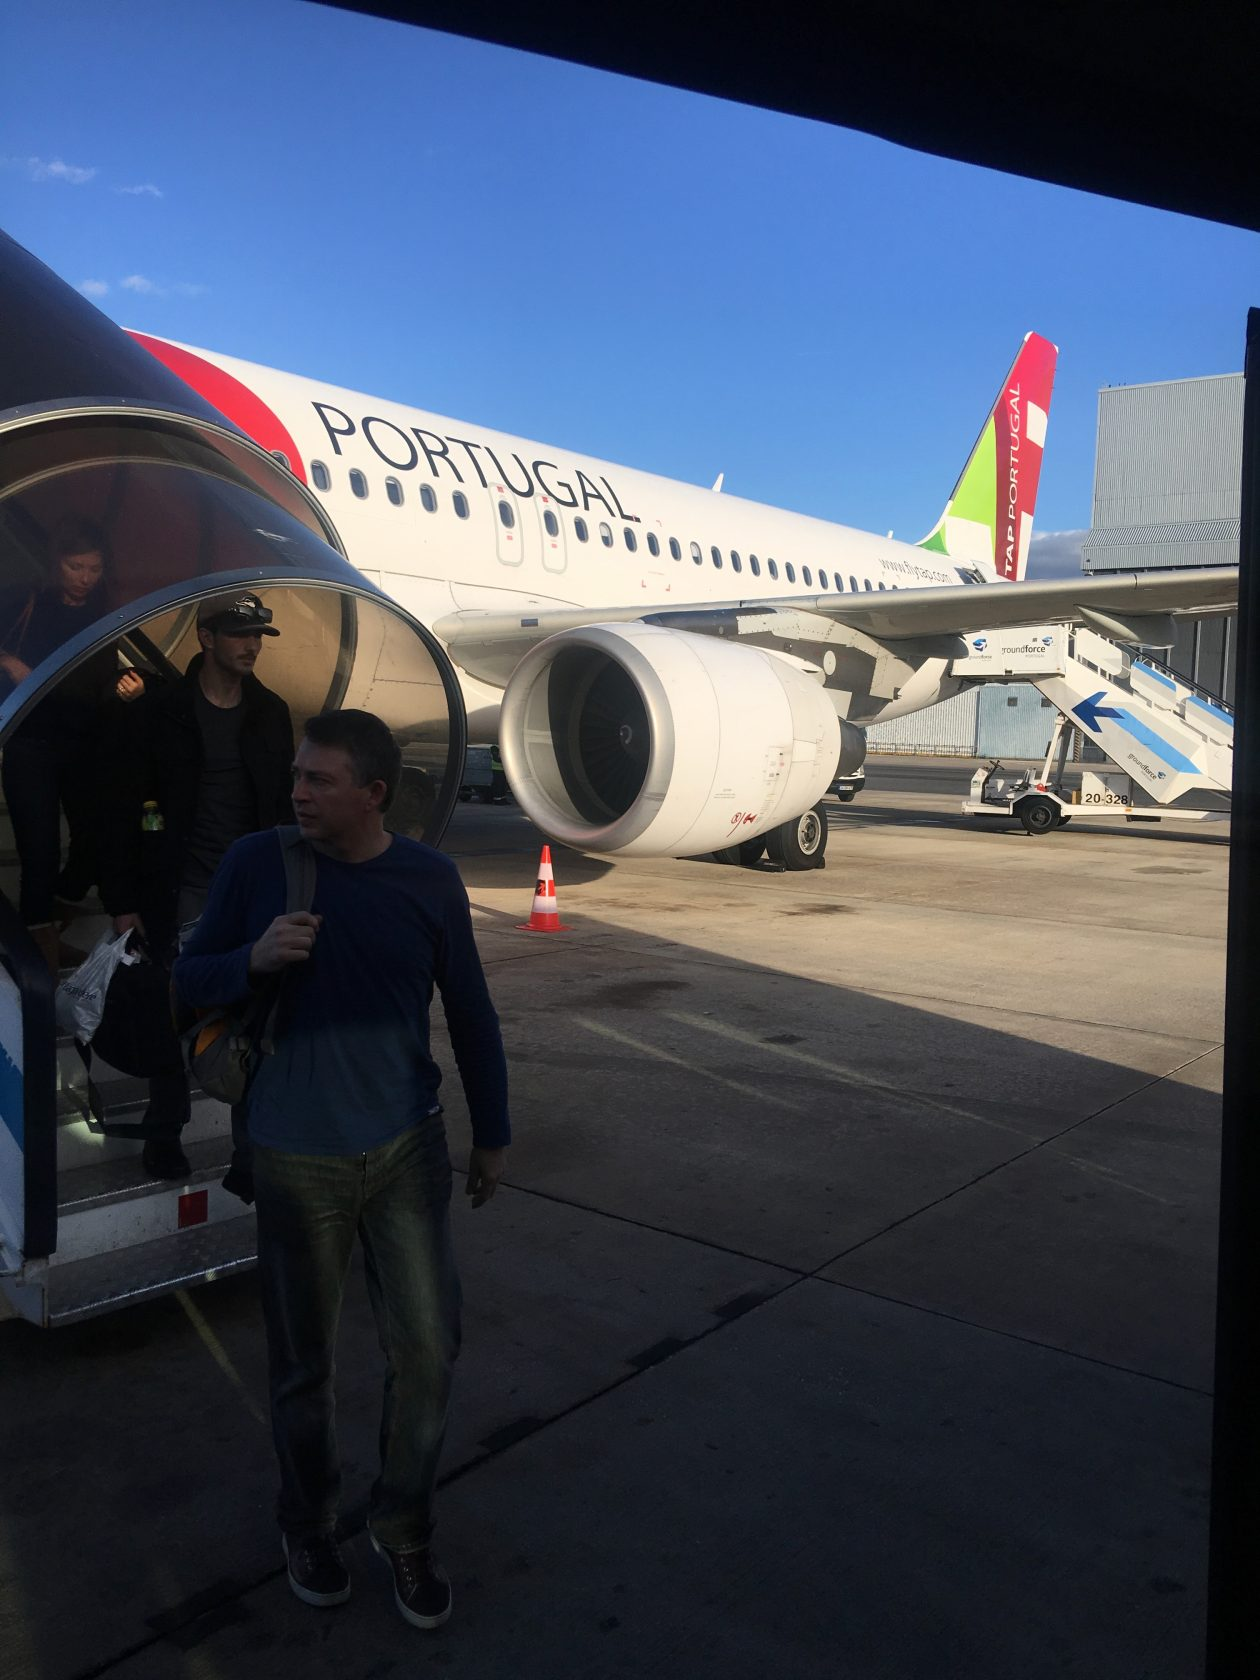 Humberto Delgado Airport (LIS)